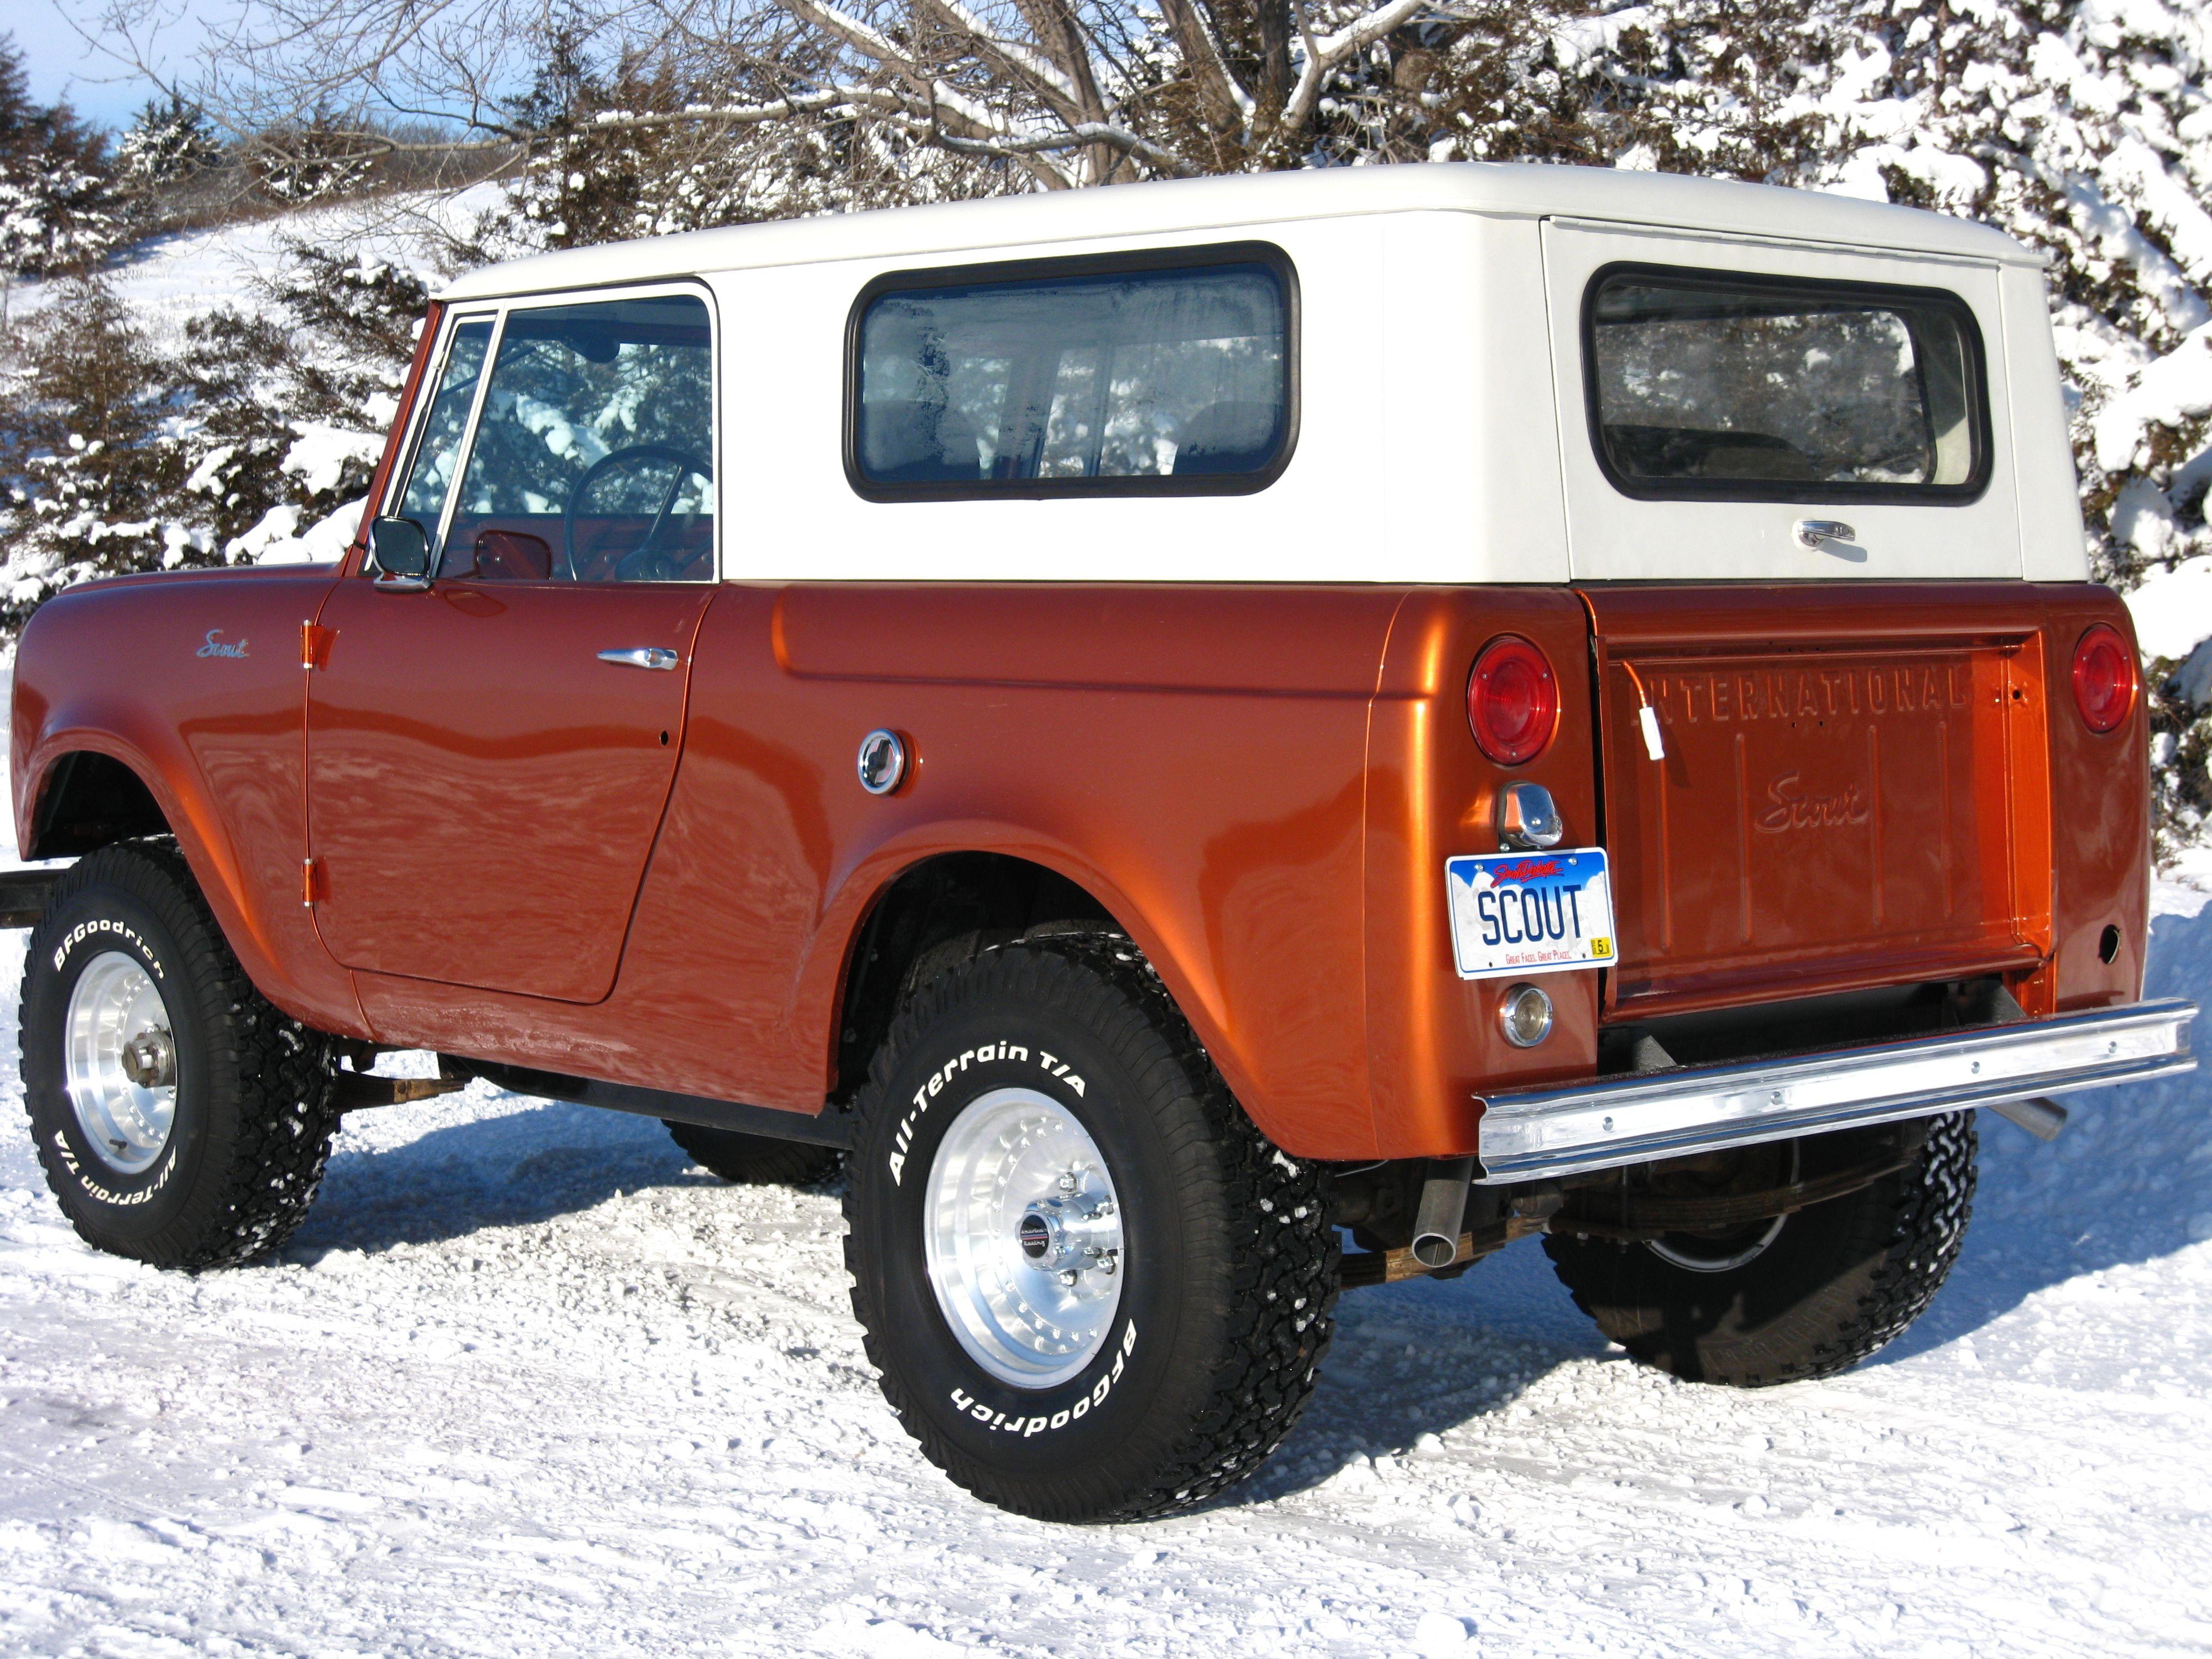 1963 scout rear international scout scout truck. Black Bedroom Furniture Sets. Home Design Ideas